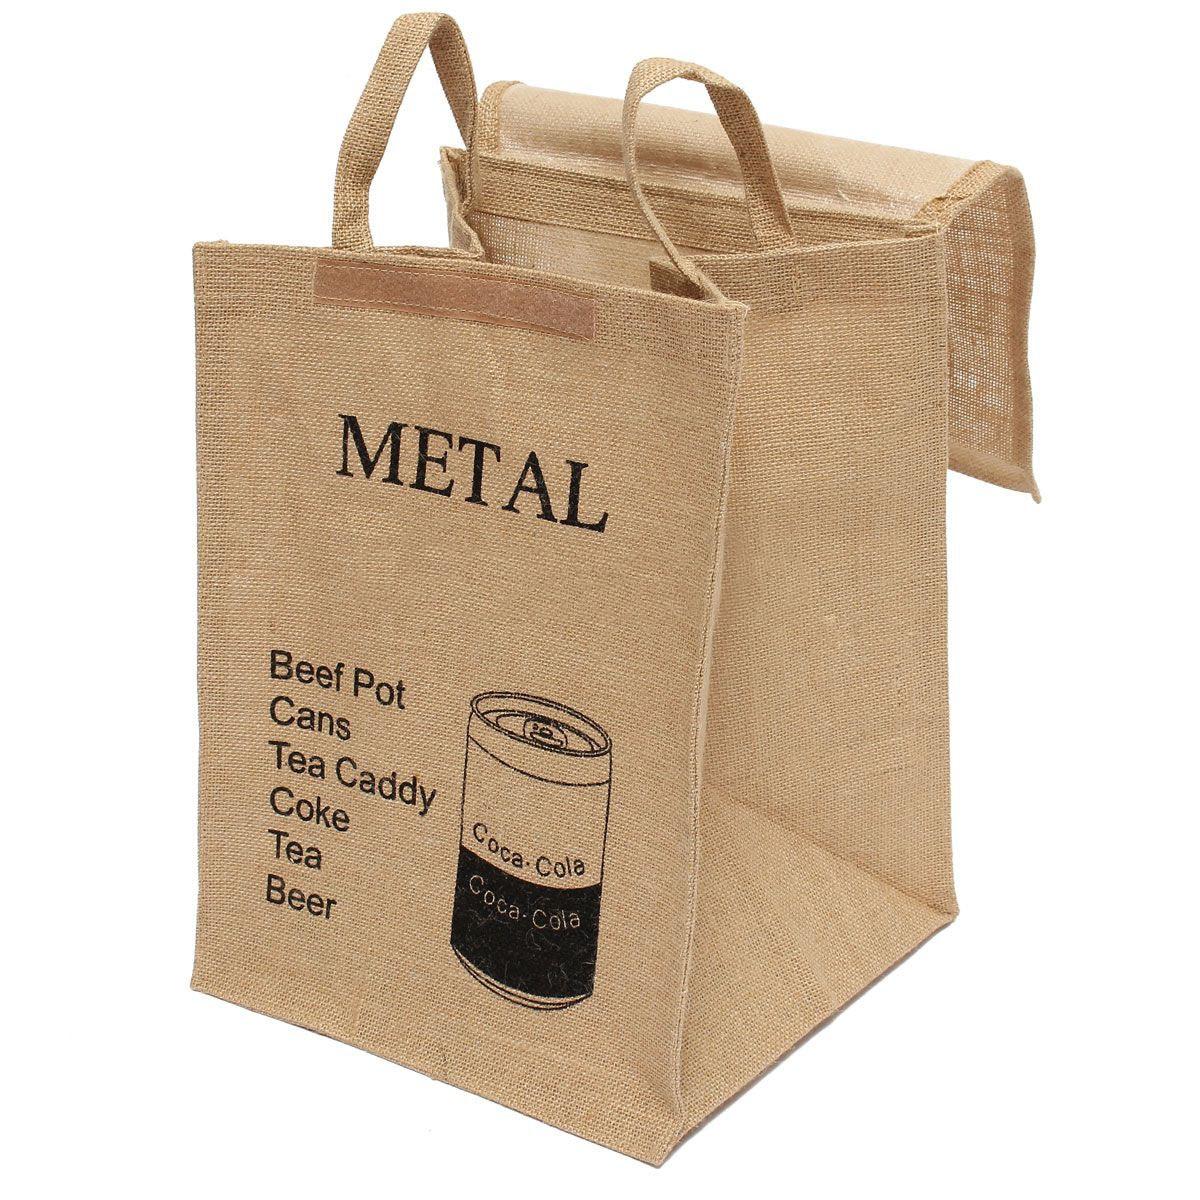 HOT-Large Cotton Linen Folding Laundry Washing Clothe Basket Bag Bin Storage Hamper